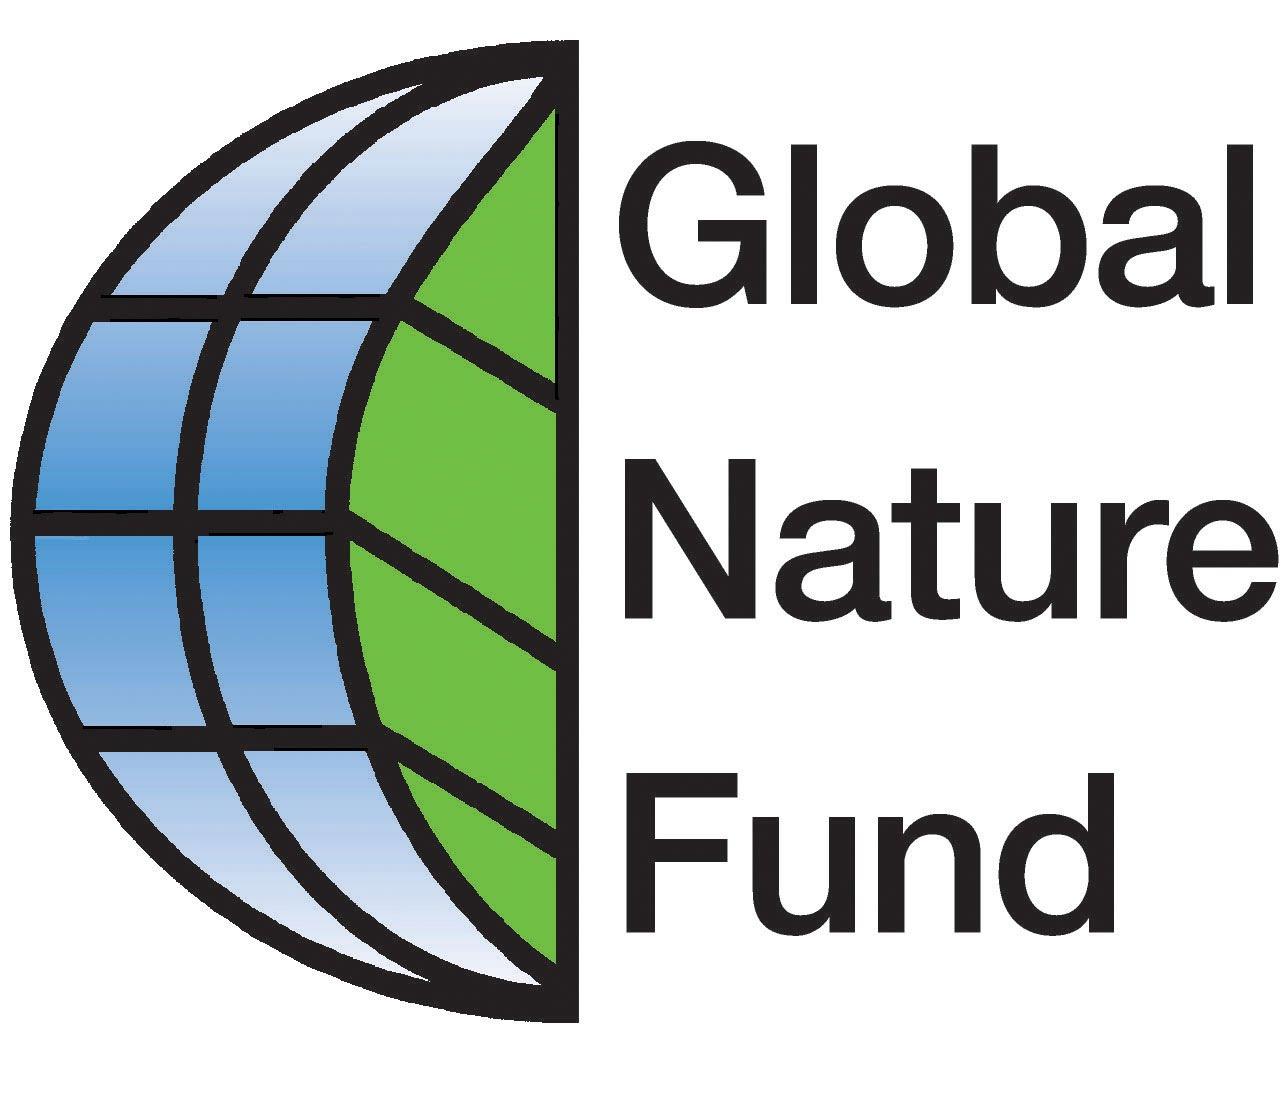 http://www.globalnature.org/en/home